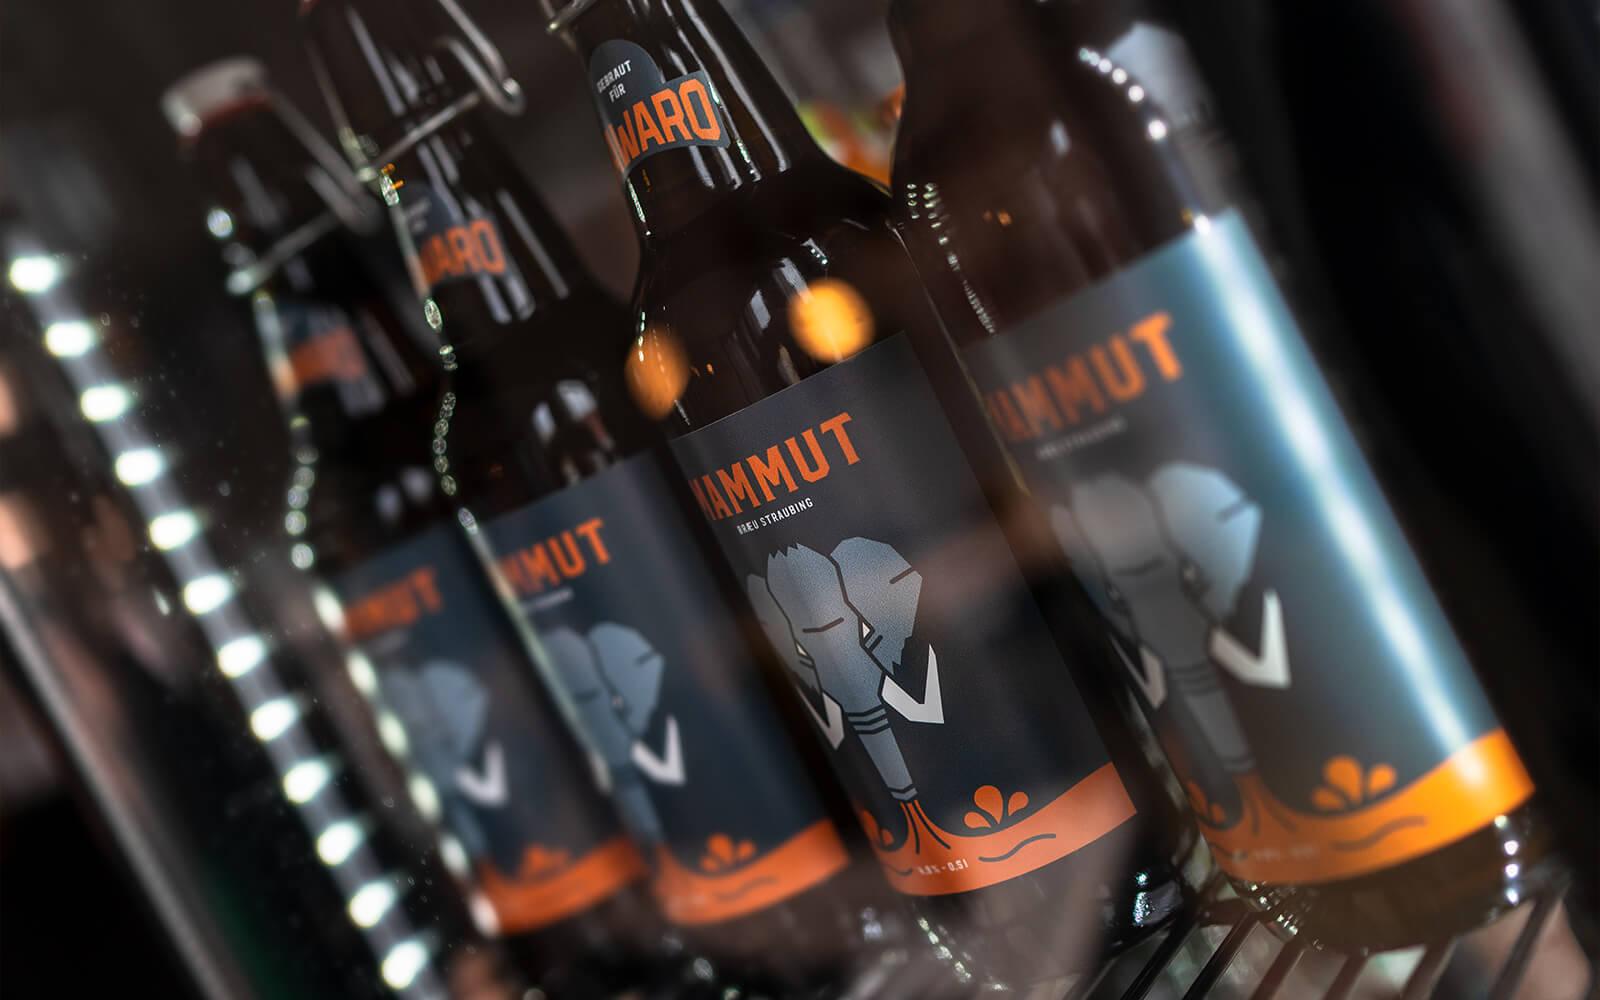 Mammut Bräu – Craft Beer Etiketten